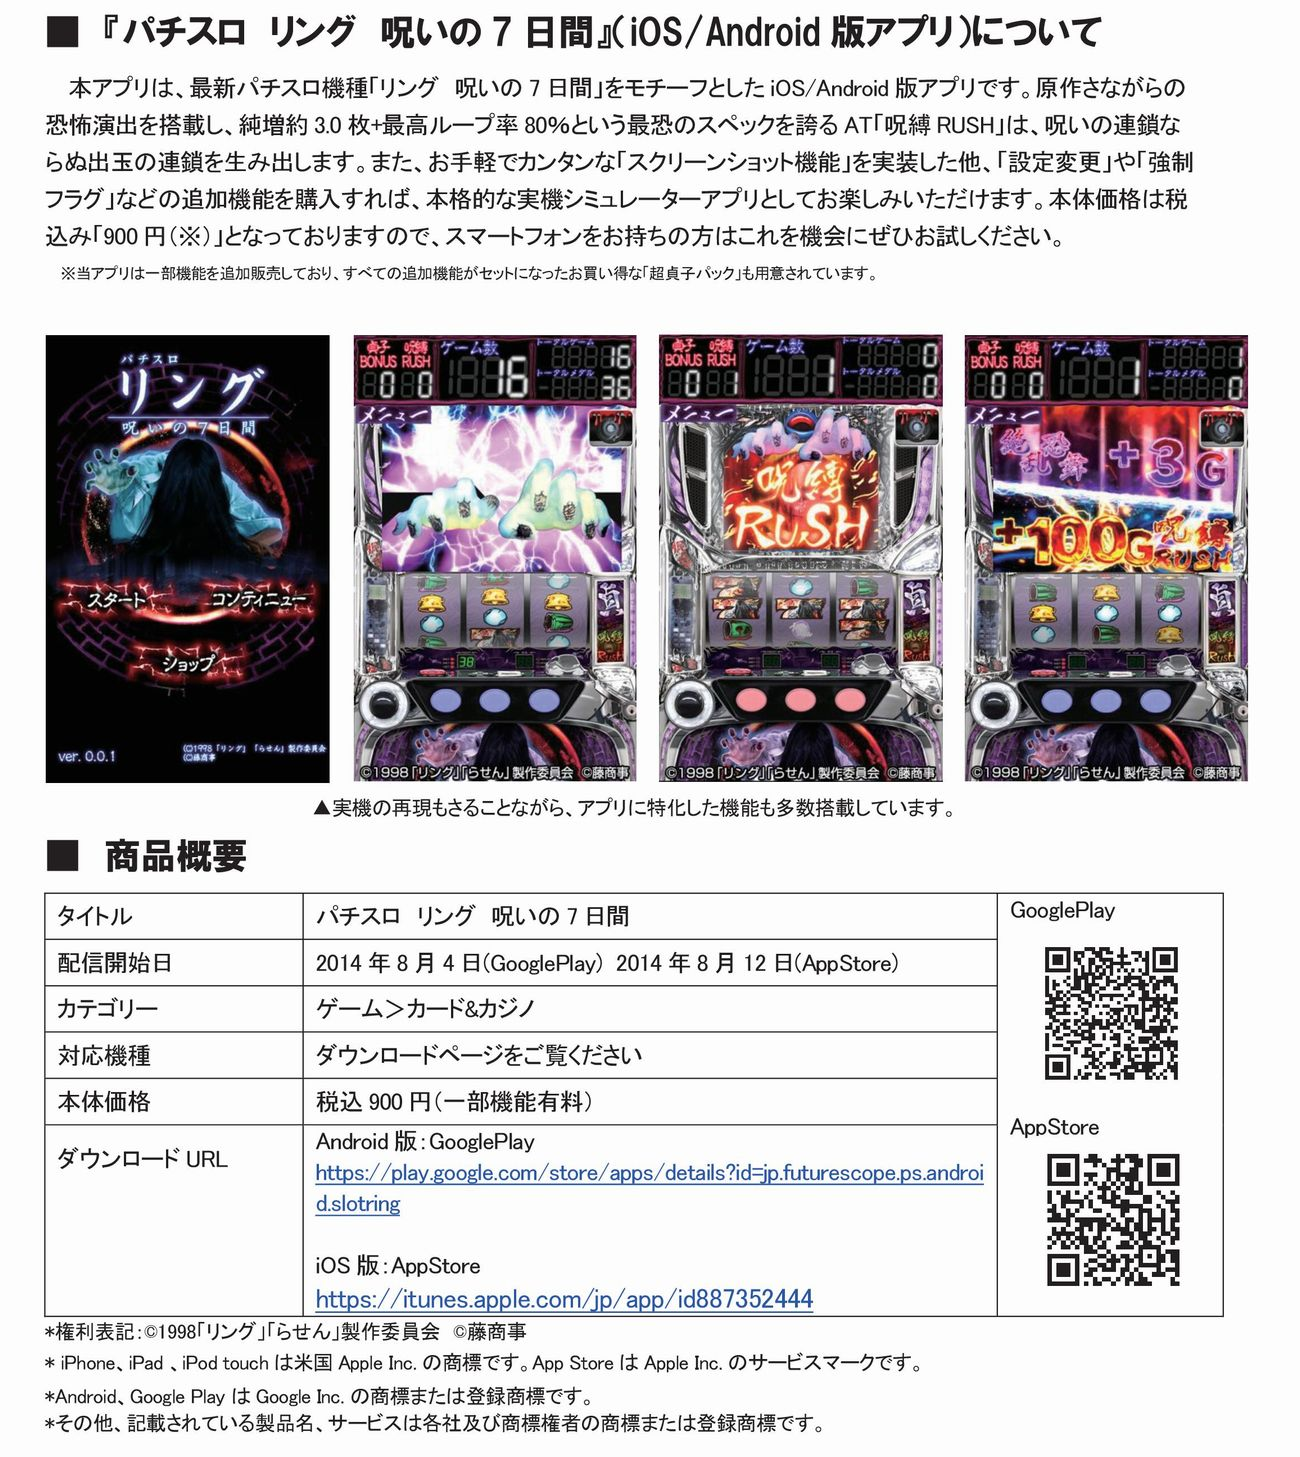 iOS版&Android版パチスロ リング大好評配信中-002